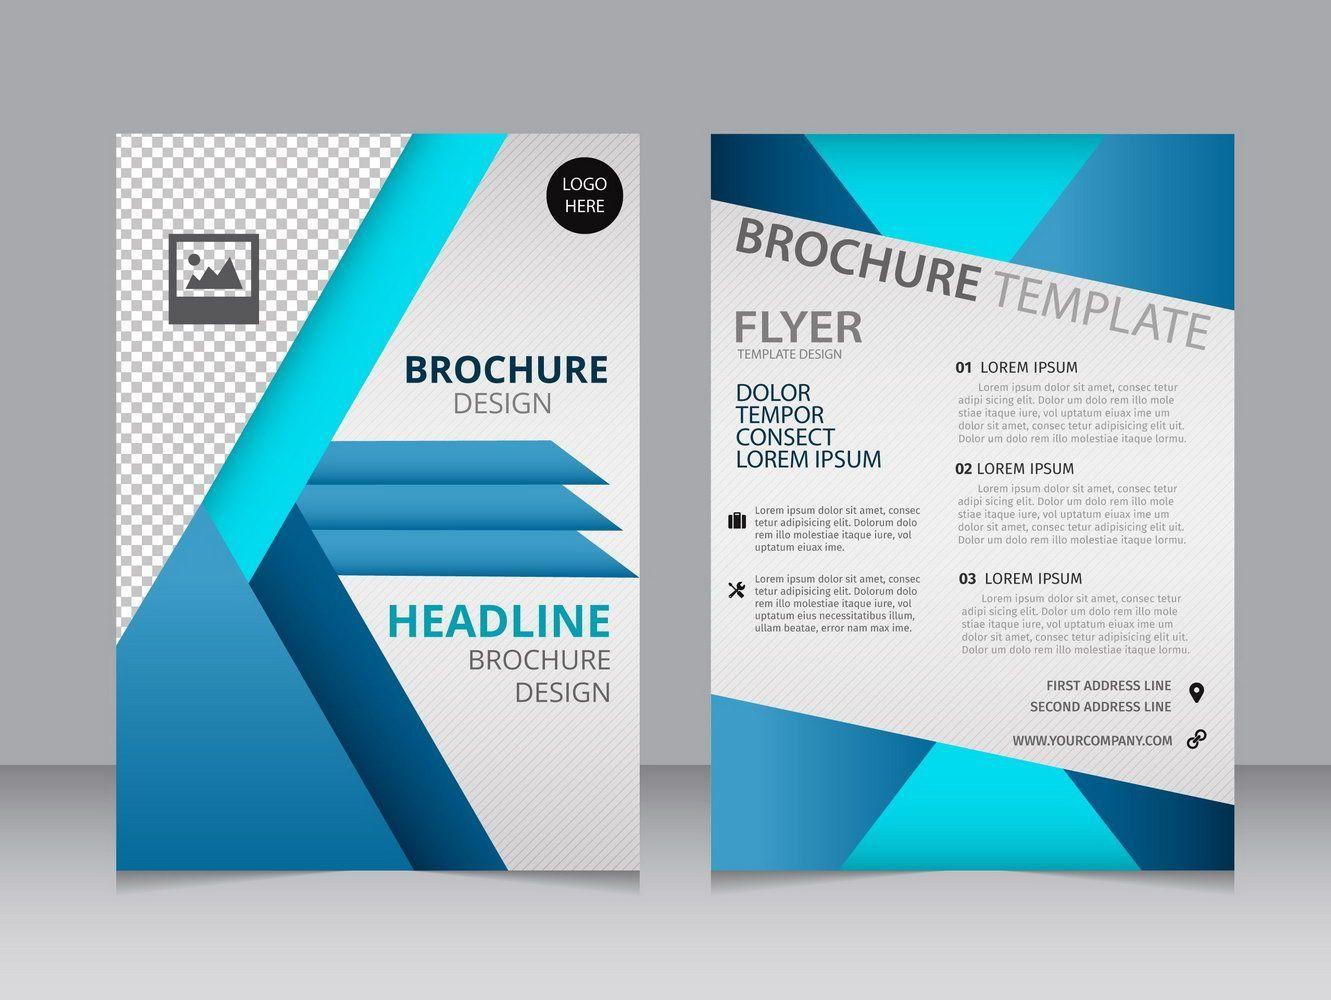 001 Impressive Brochure Template For Word 2010 Example  Download Microsoft Free Blank Tri FoldFull